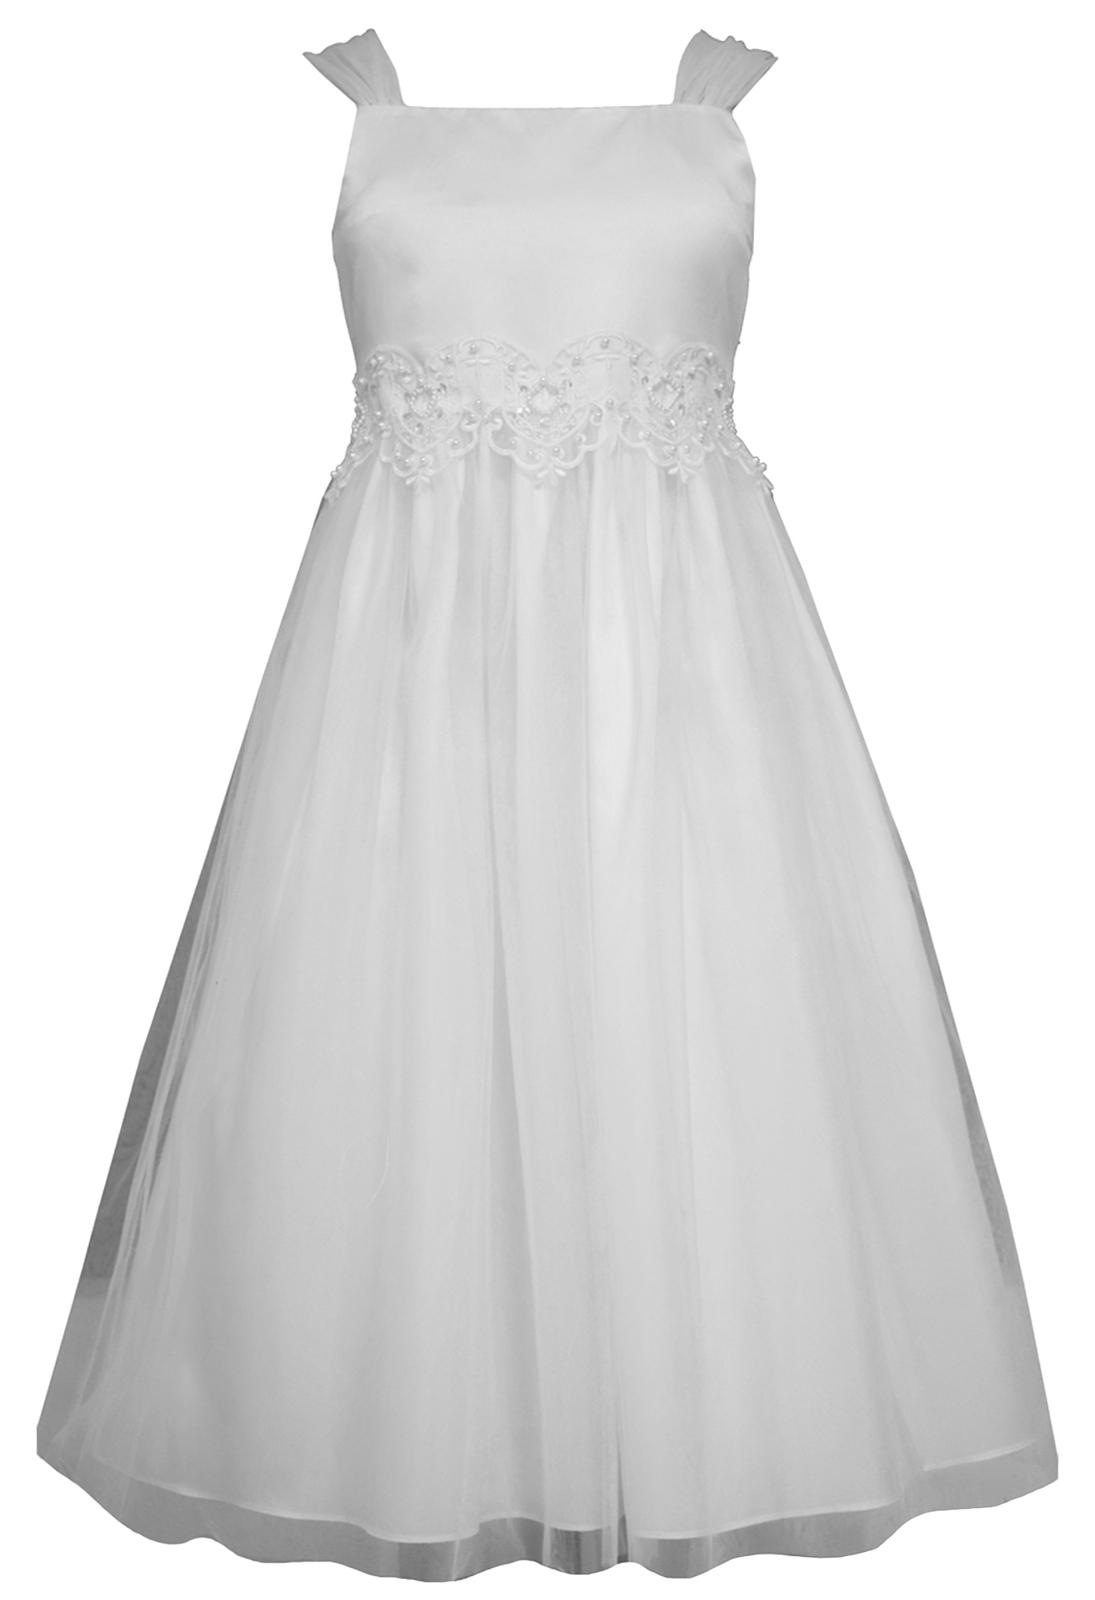 Big Girls Tween White Shirred Strap Venice Tulle Communion Flower